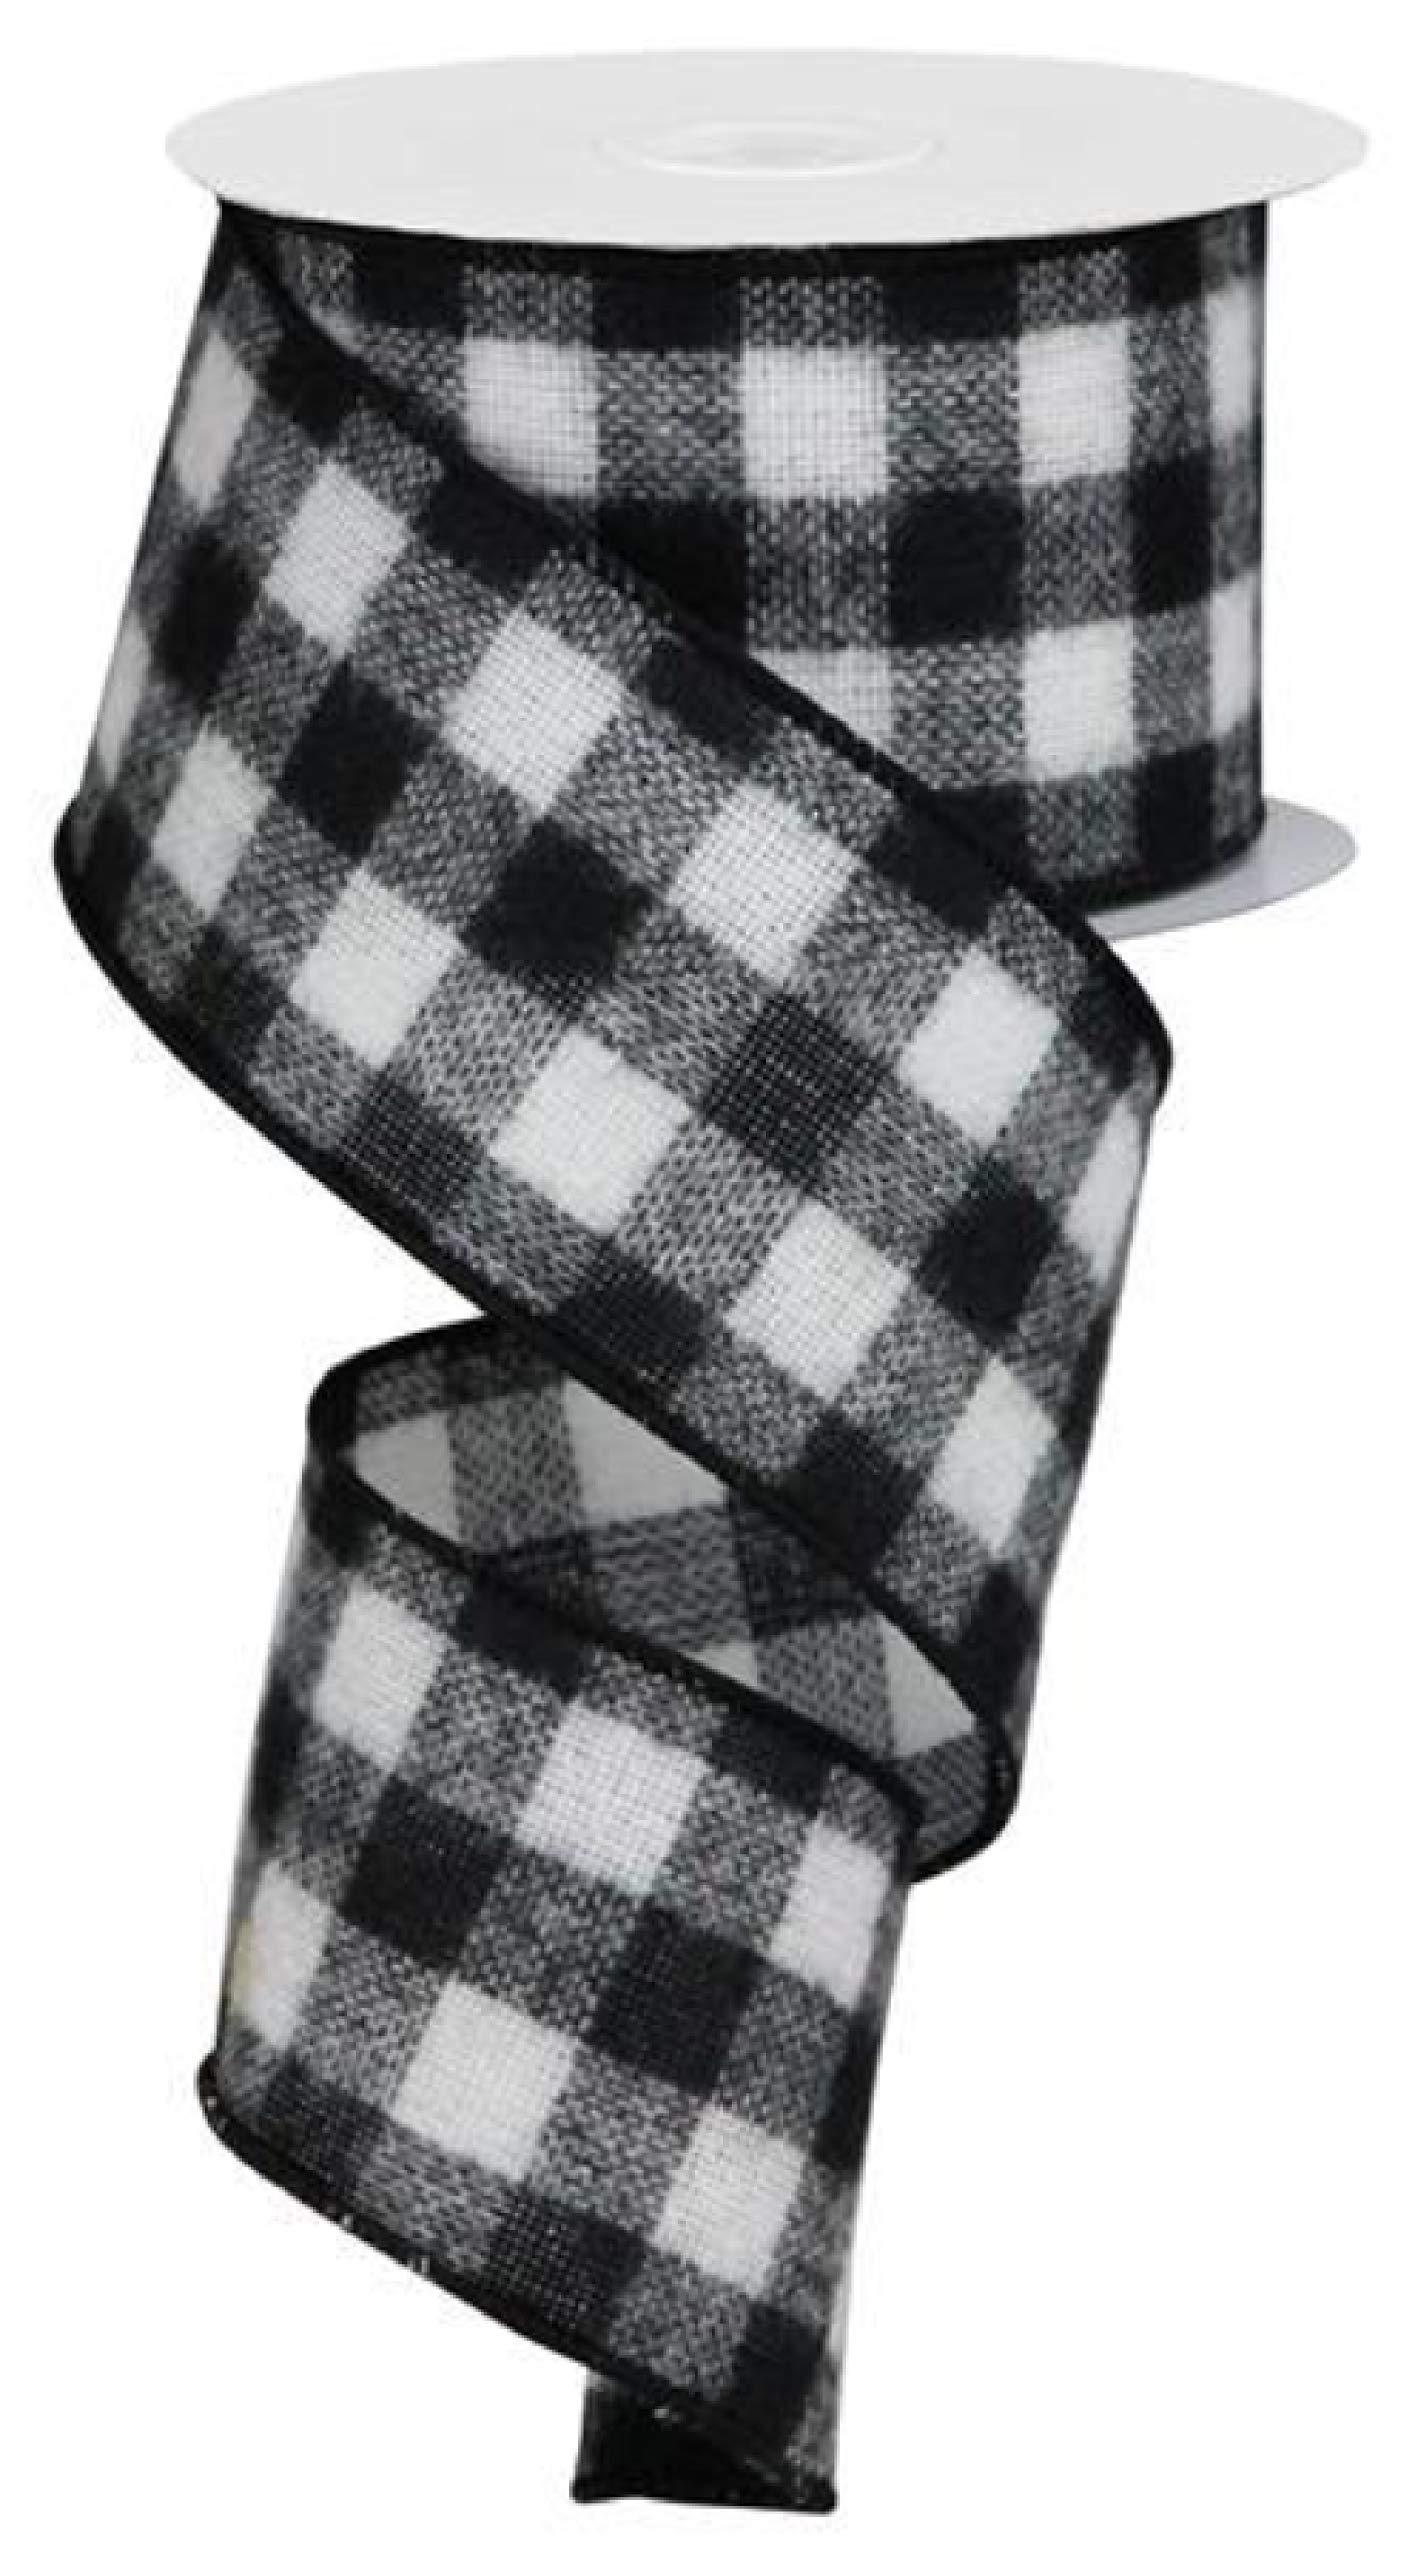 Flannel Check Plaid Wired Edge Ribbon, 10 Yards (Black, White, 2.5'') by Craig Bachman